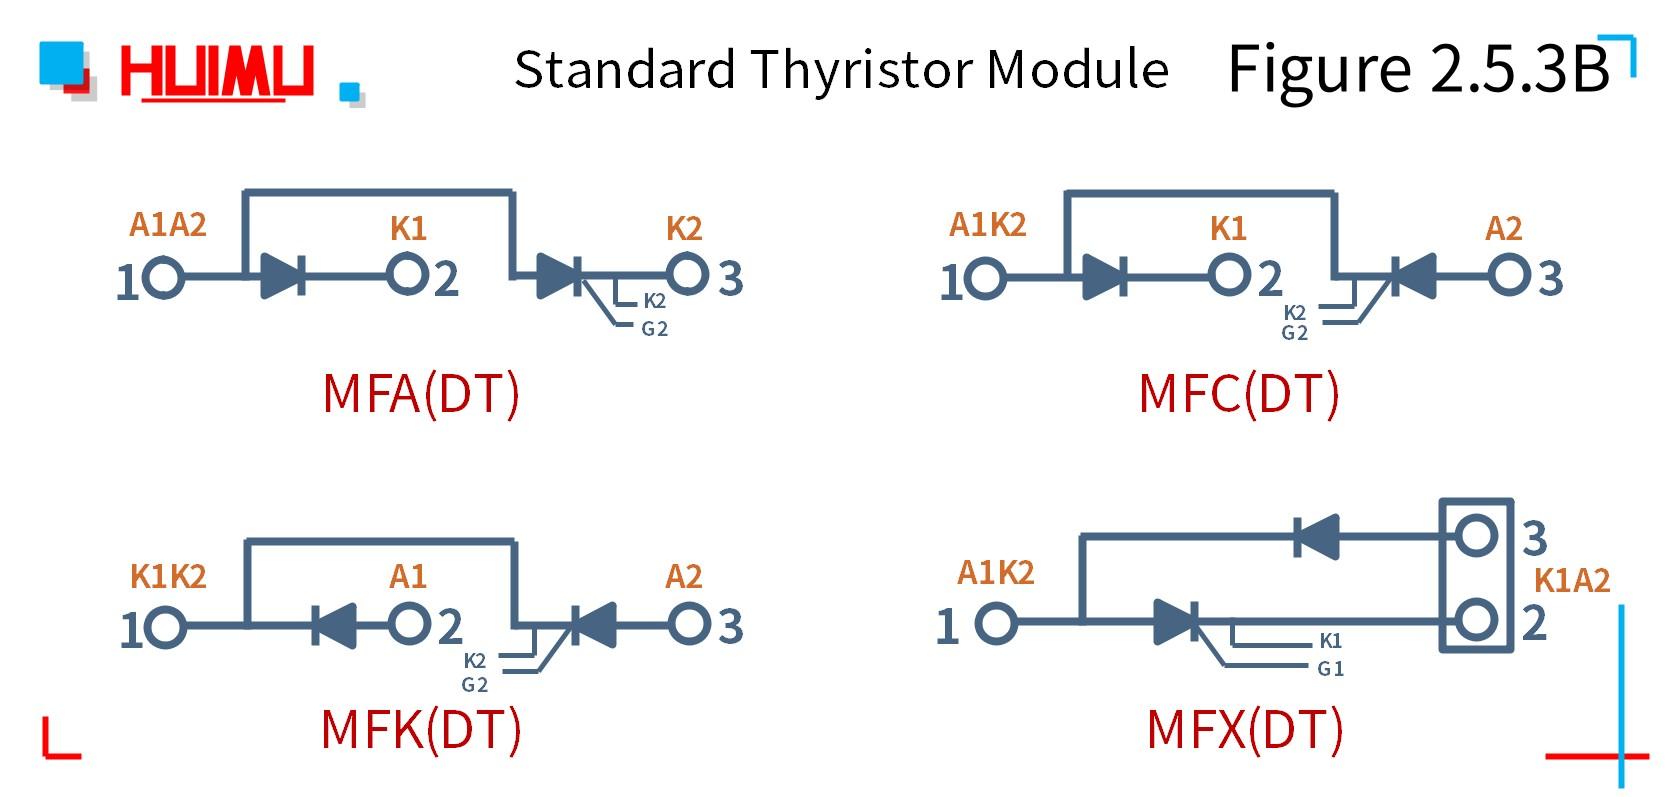 Wiring diagram of MFx(DT)